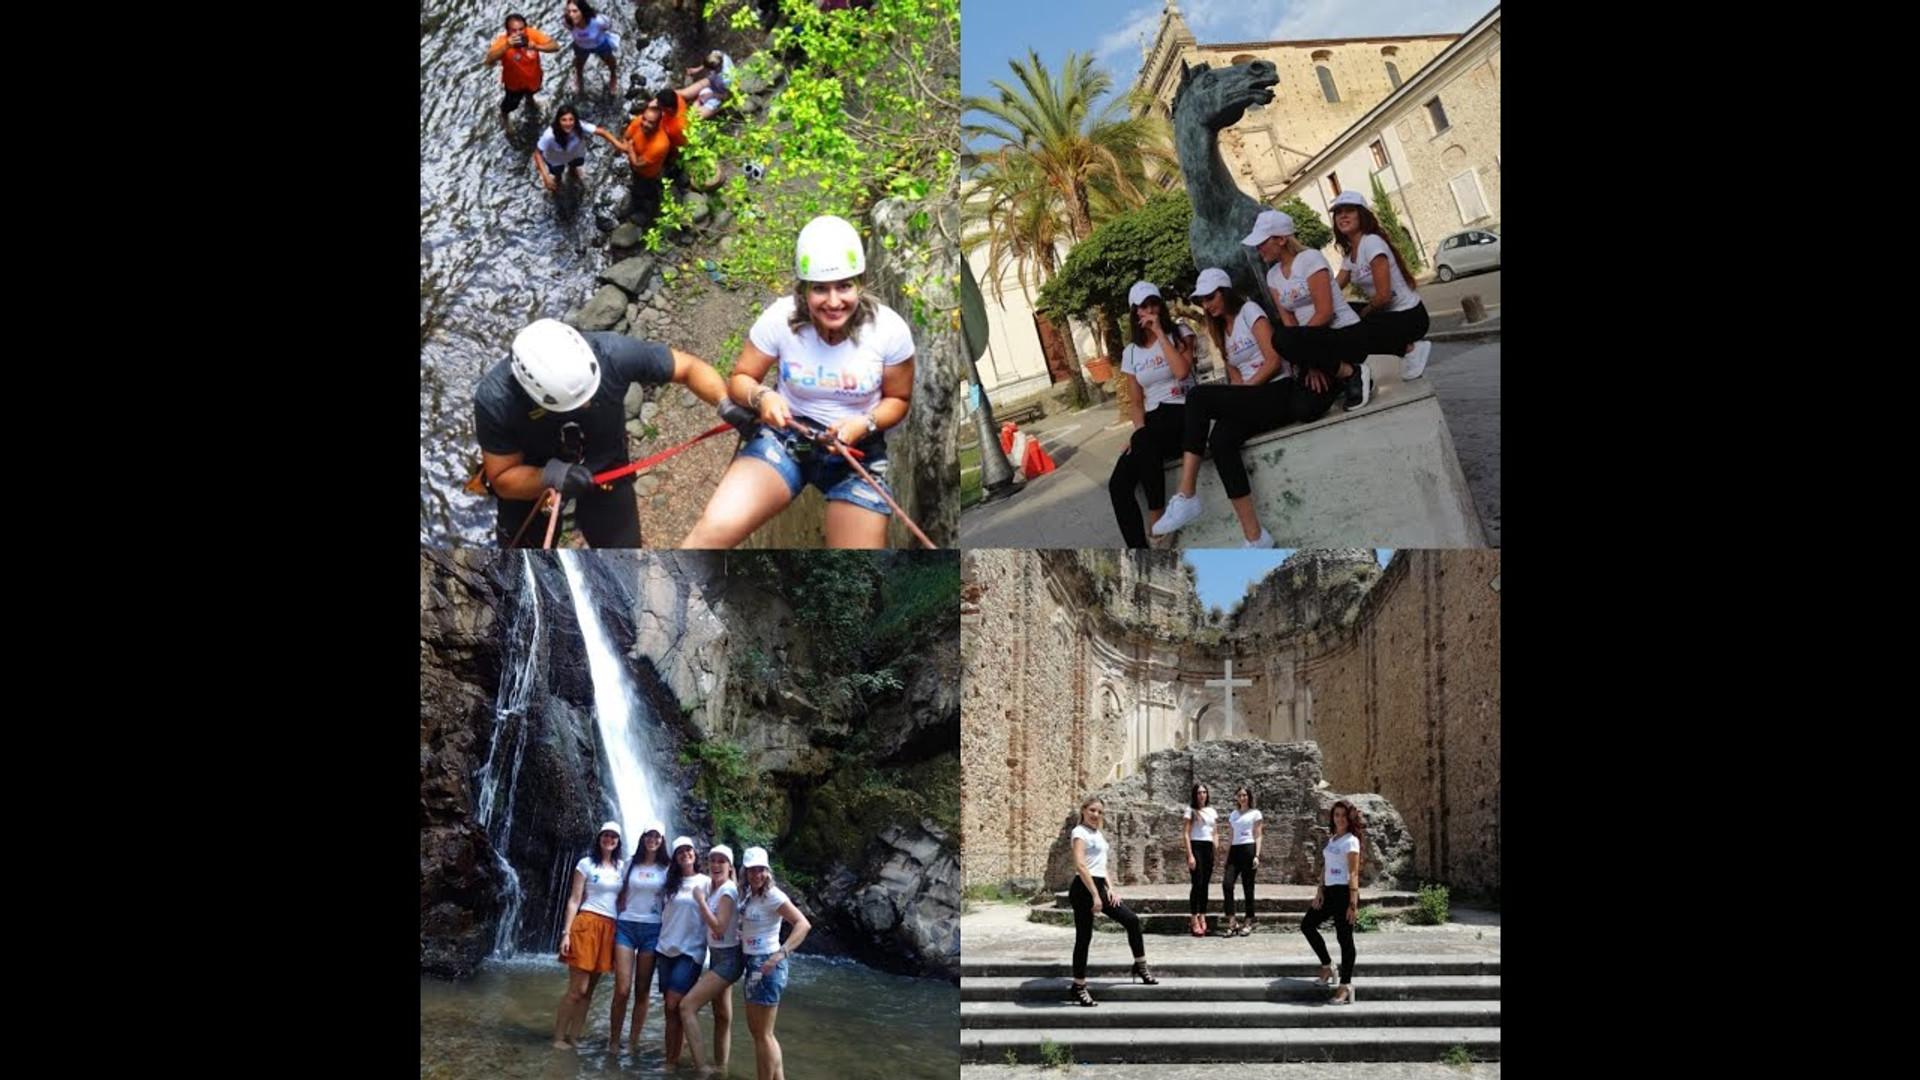 Calabria avventura - Cascate del Cannavina